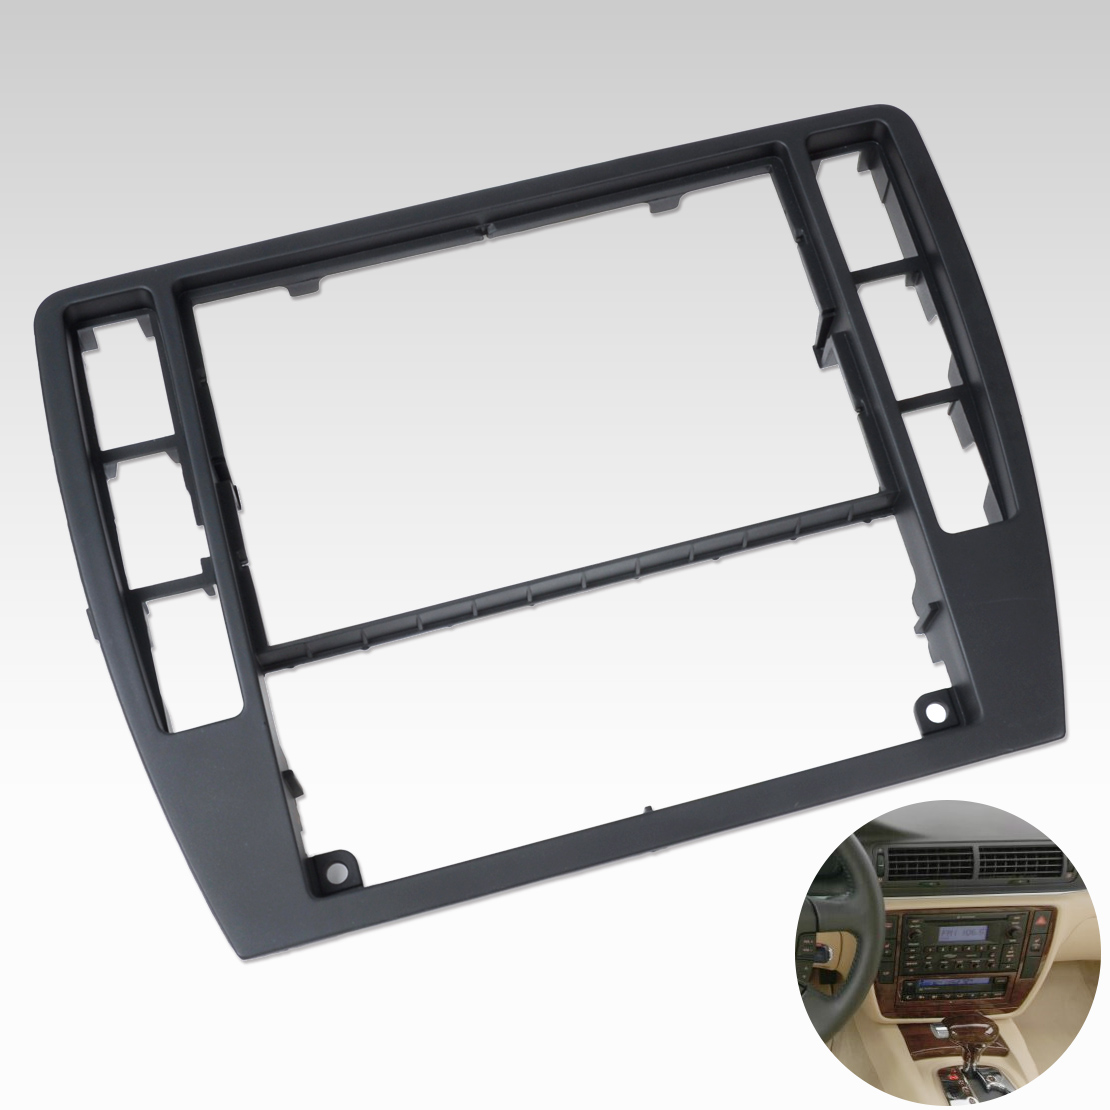 ᐅDwcx 3B0858069 nuevo ABS tablero interior consola central TRIM ...